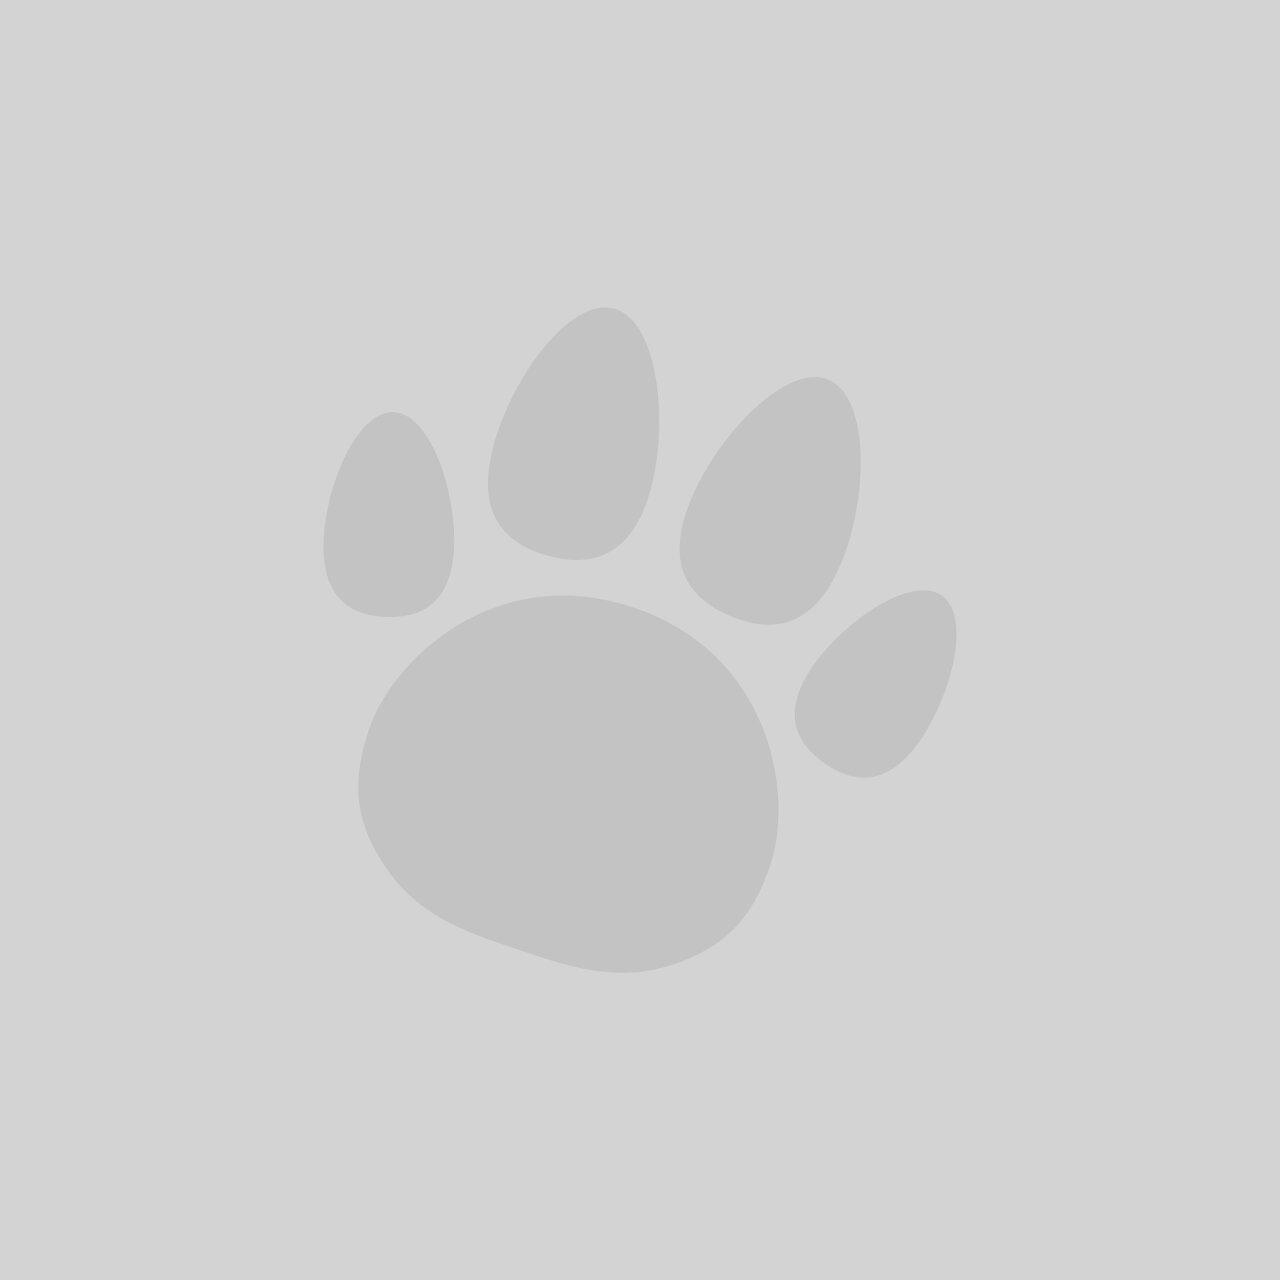 Hill's Science Plan Adult Medium Dry Dog Food Lamb & Rice Flavour 14kg